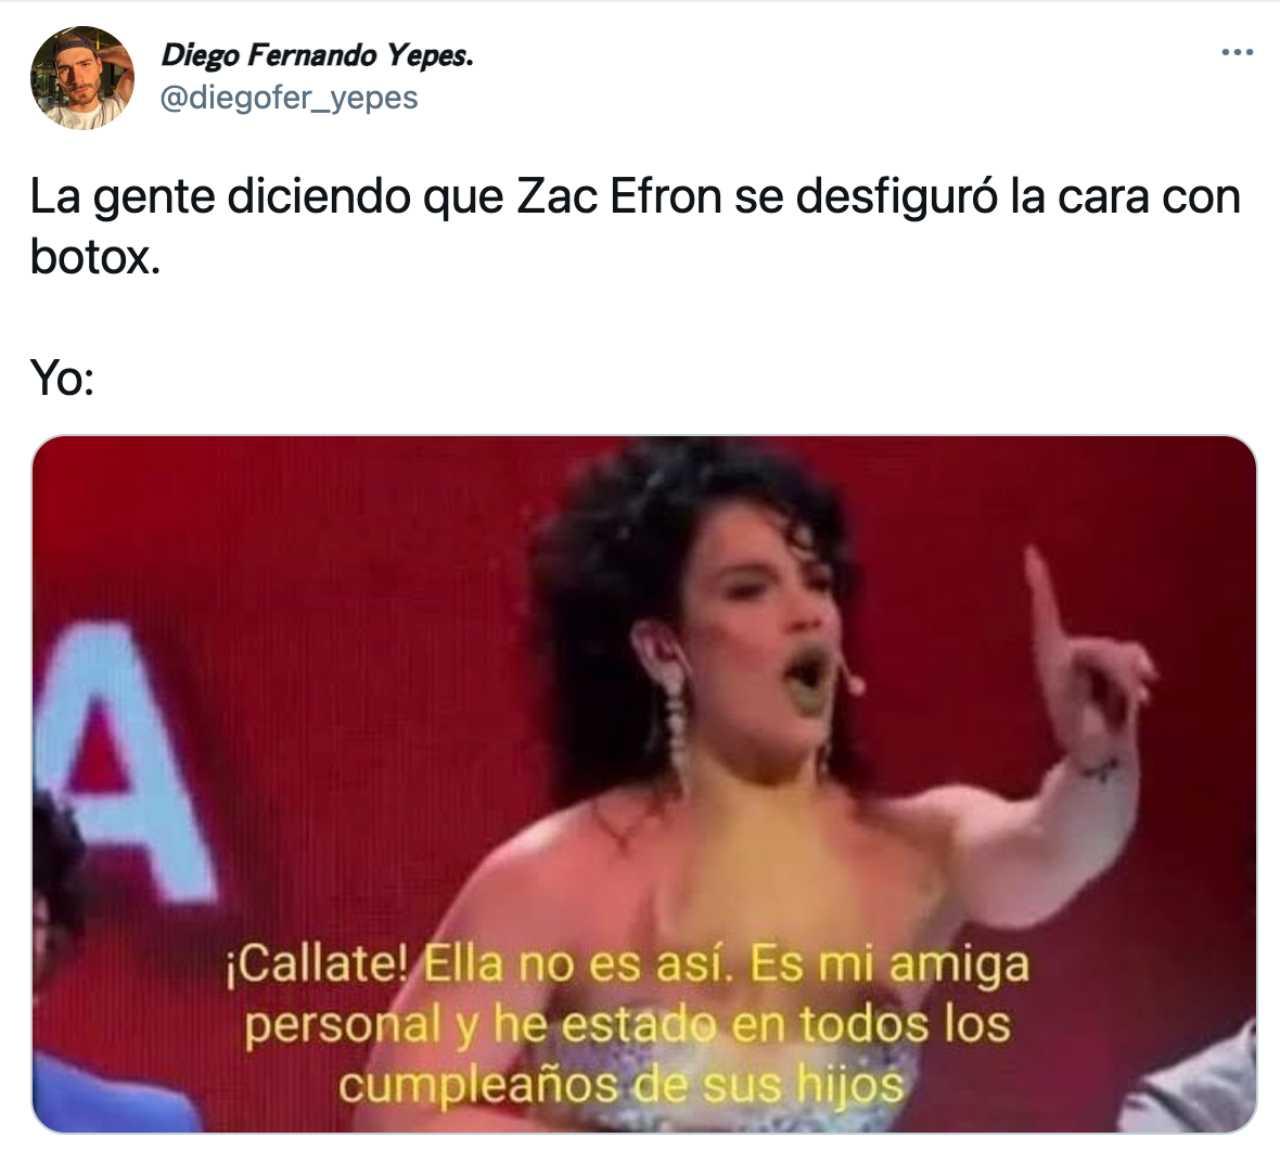 Meme de Zac Efron con Niurka